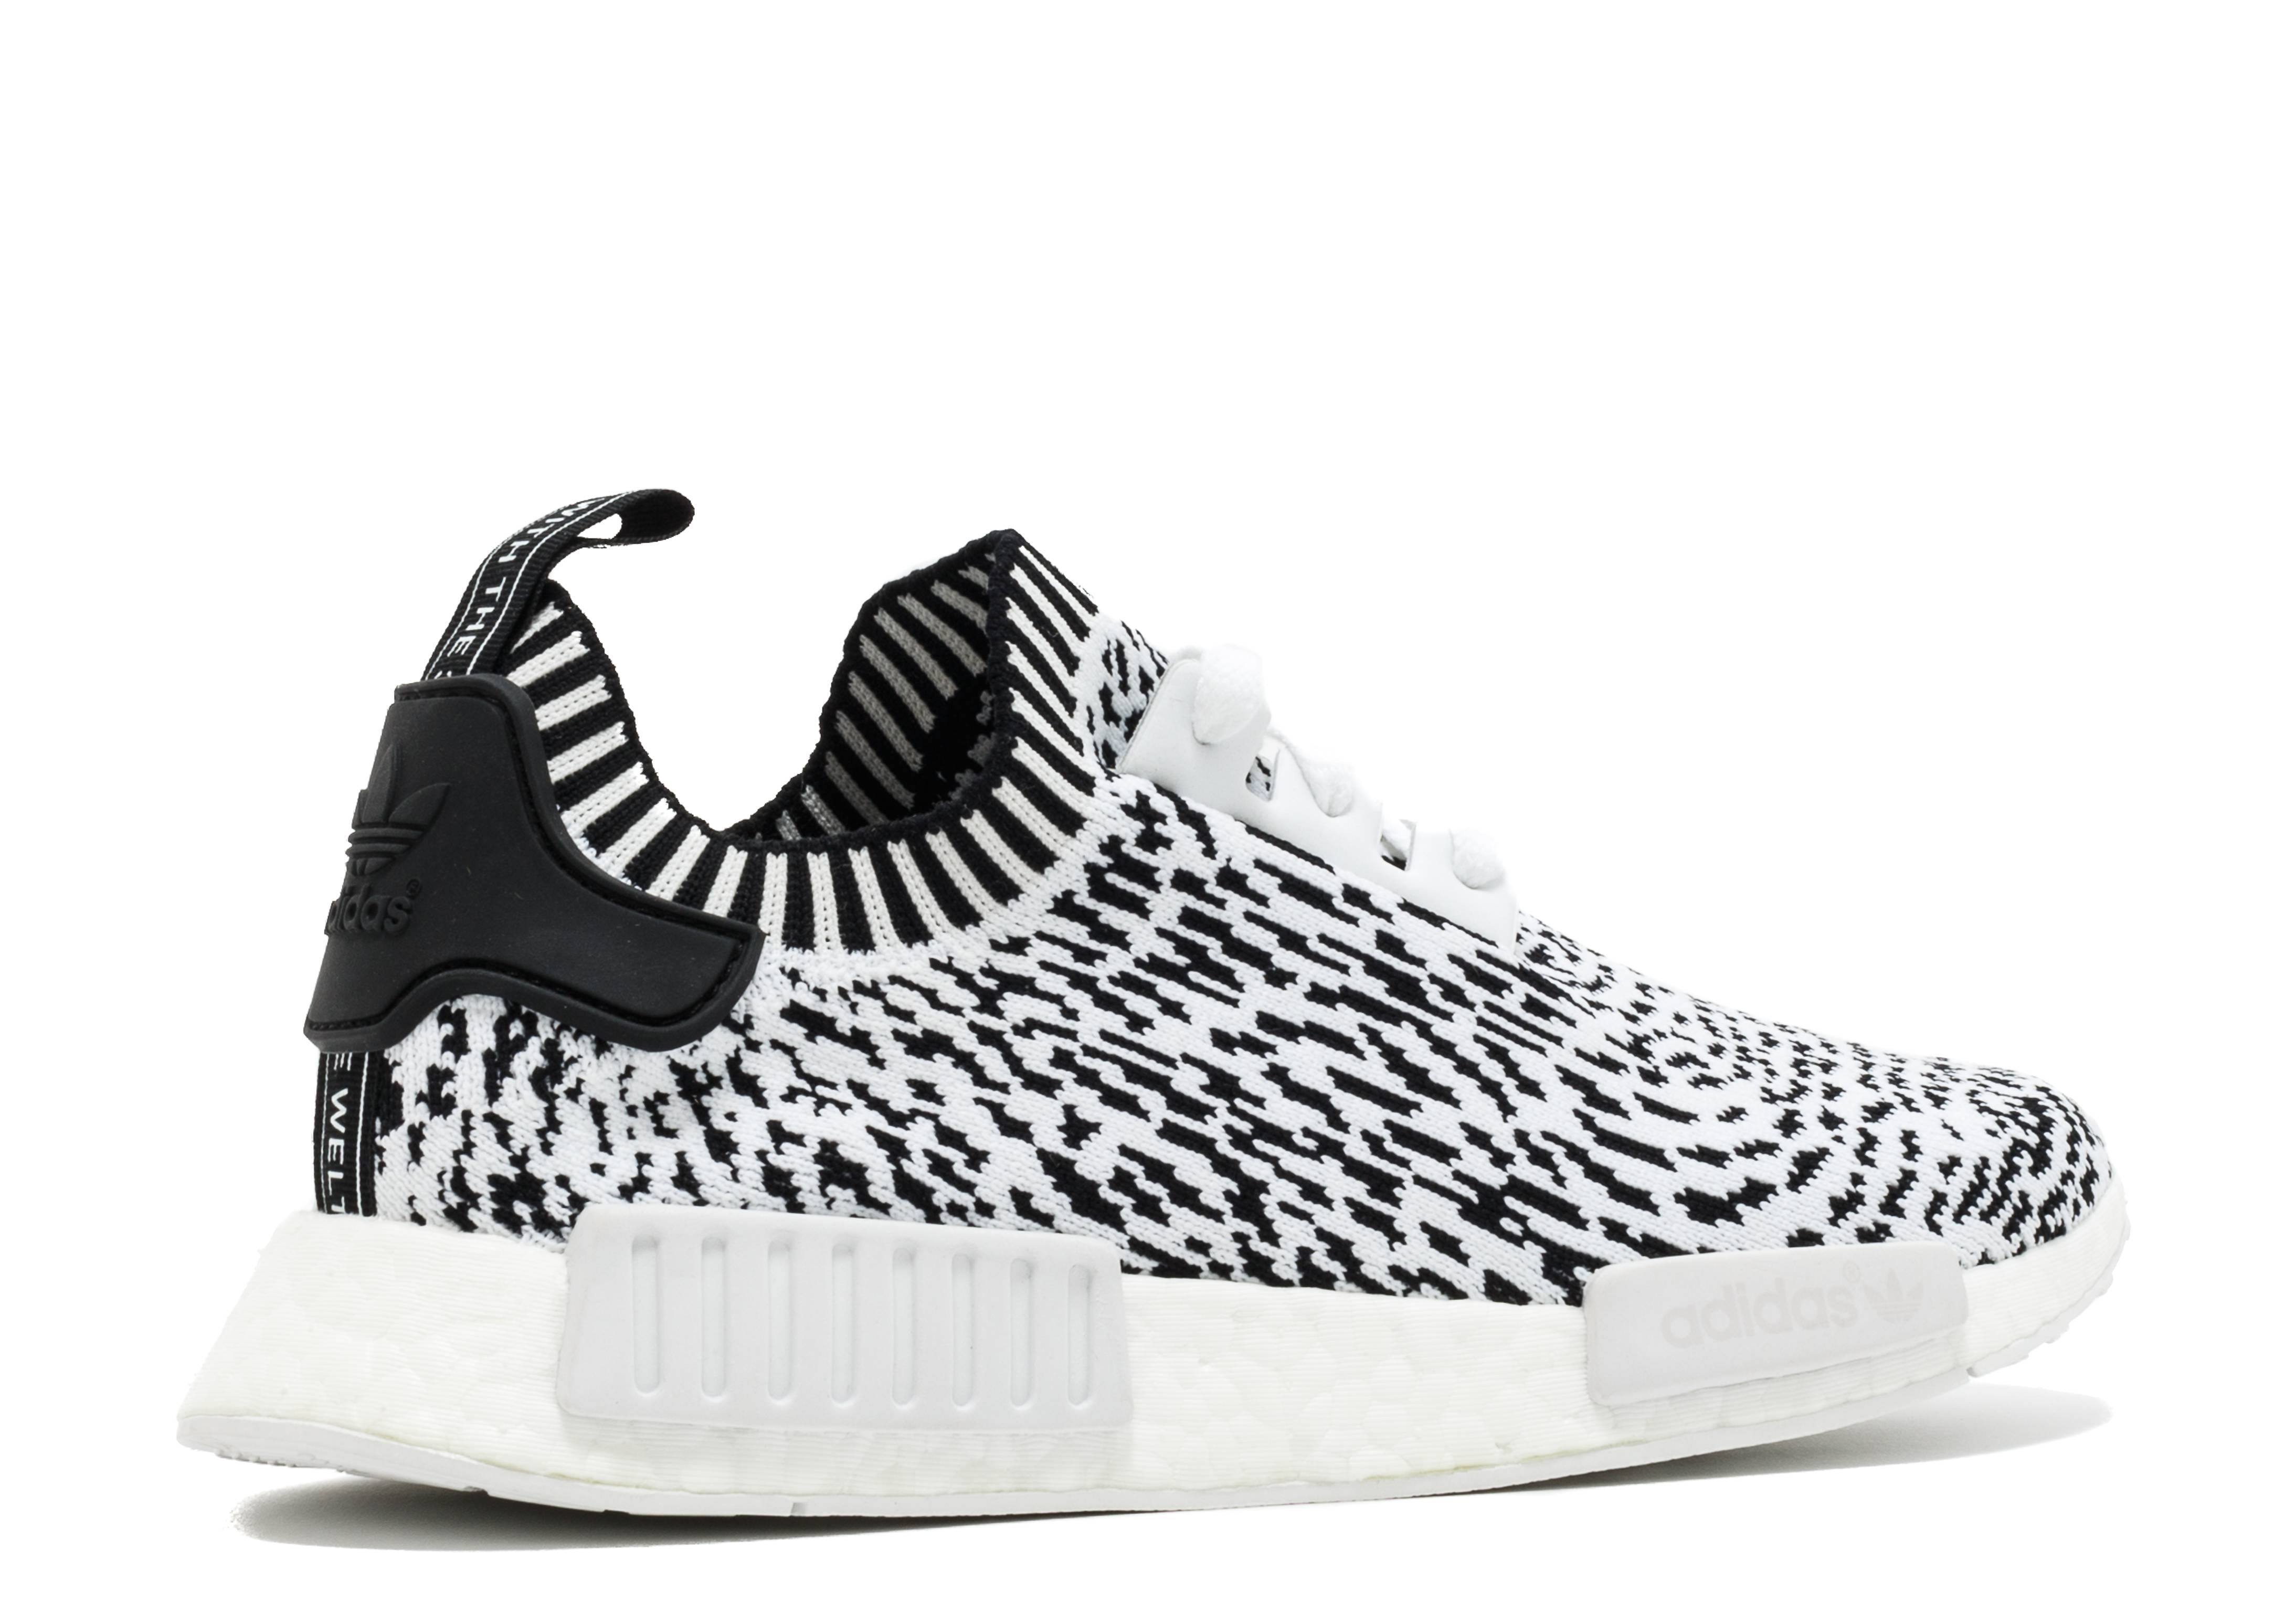 e782b11f3c59 NMD R1 PK - Adidas - bz0219 - white black white